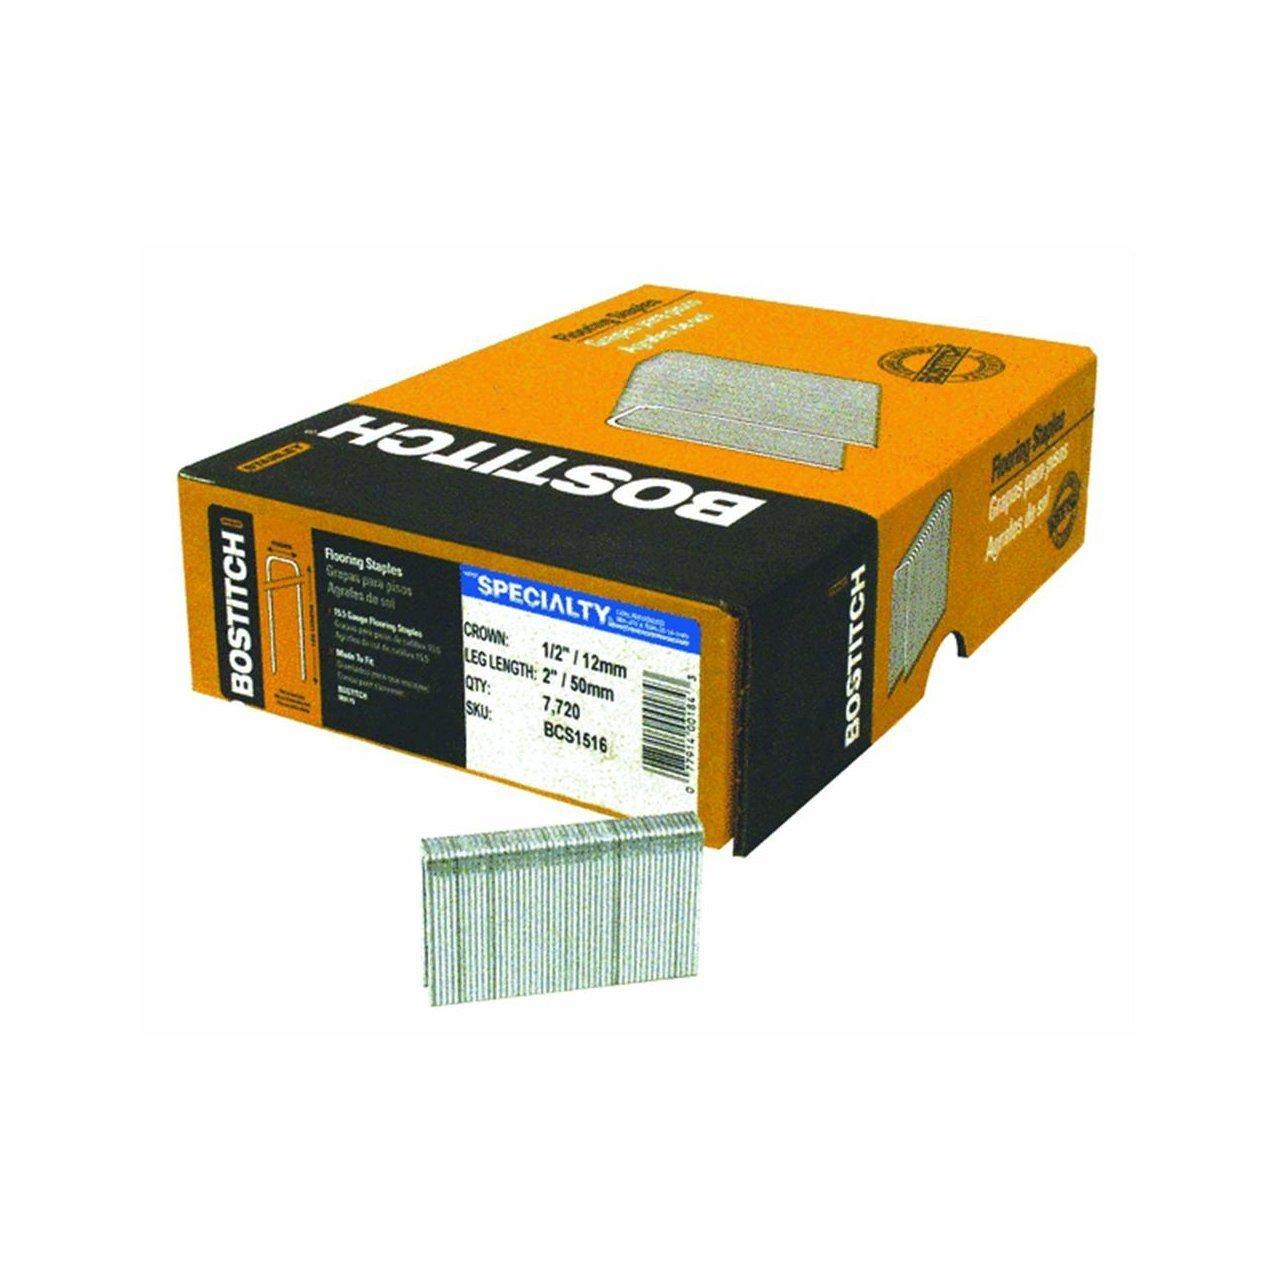 Bostitch BCS1516 2'' Leg 15-1/2-Gauge 1/2'' Crown Hardwood Flooring Staples - 7720 per Package by BOSTITCH